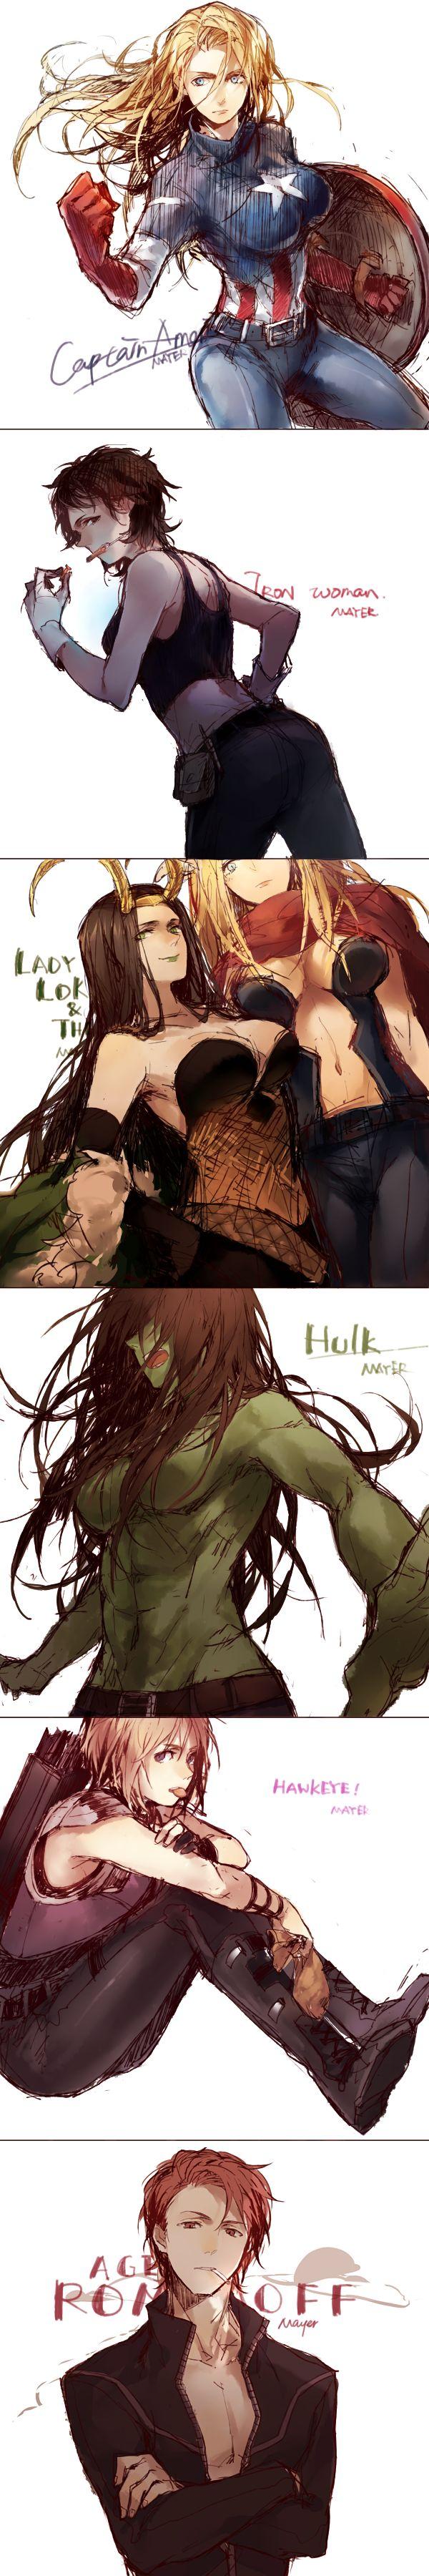 Lady Avengers Anime Version